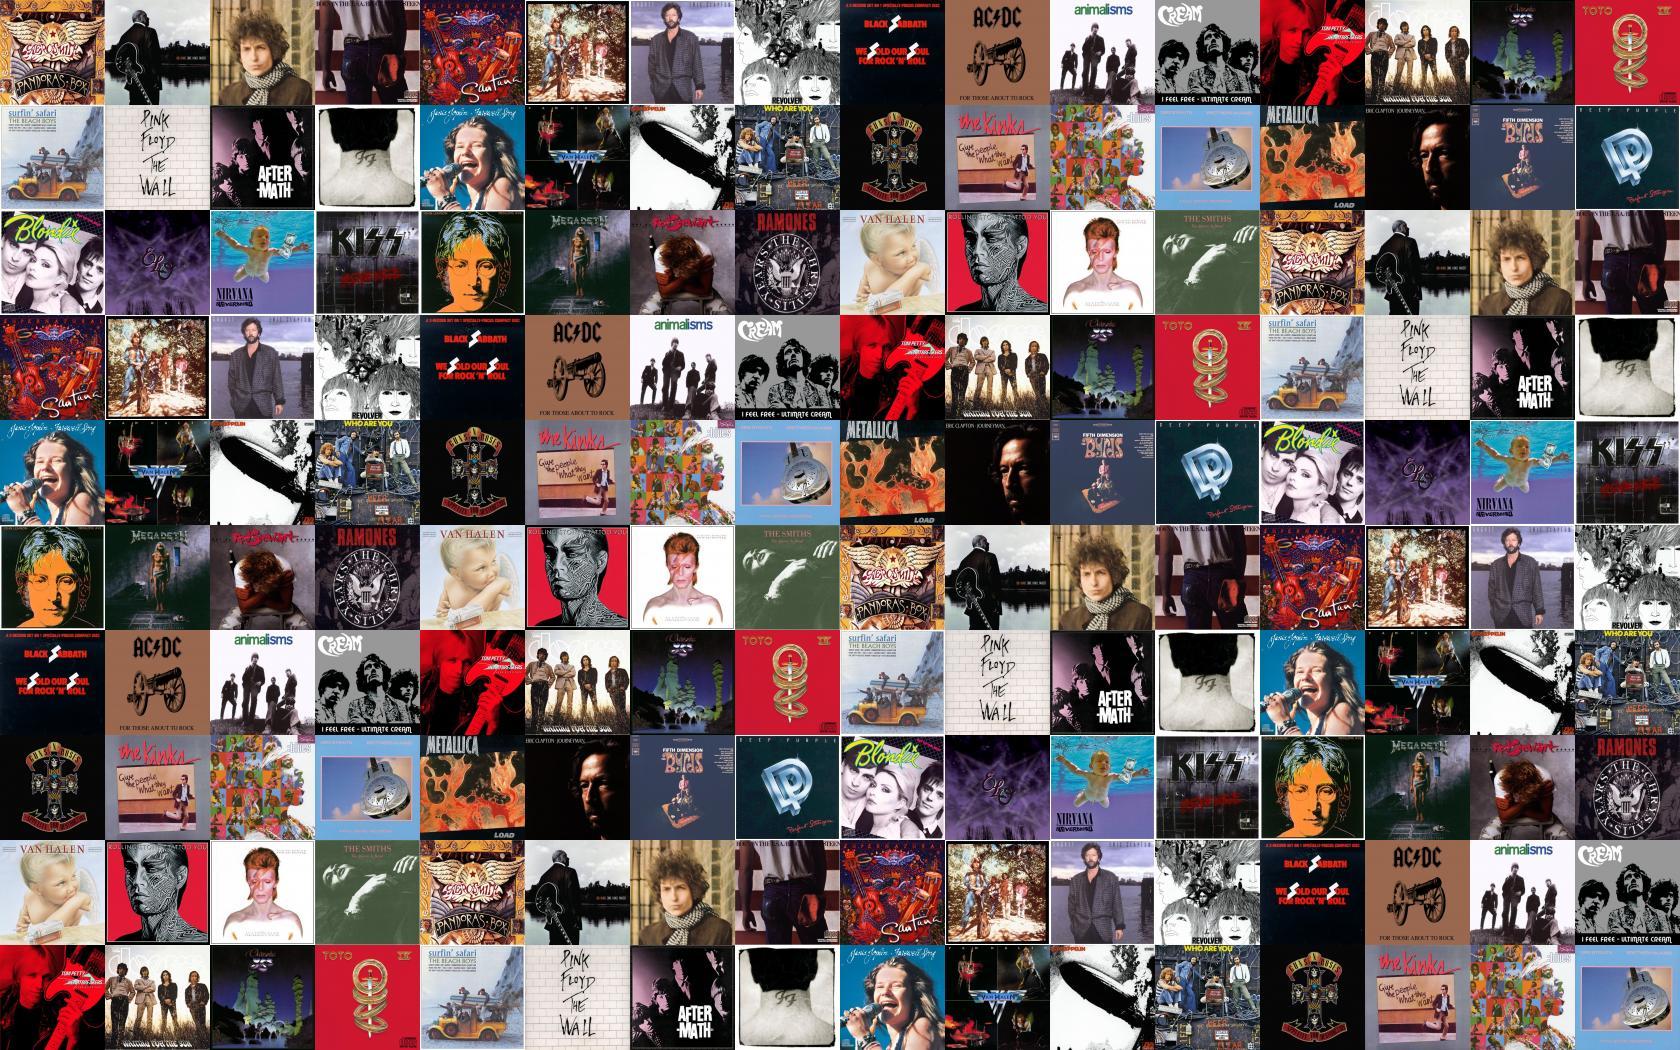 Aerosmith Pandora S Box B B King One Wallpaper Tiled Desktop Wallpaper